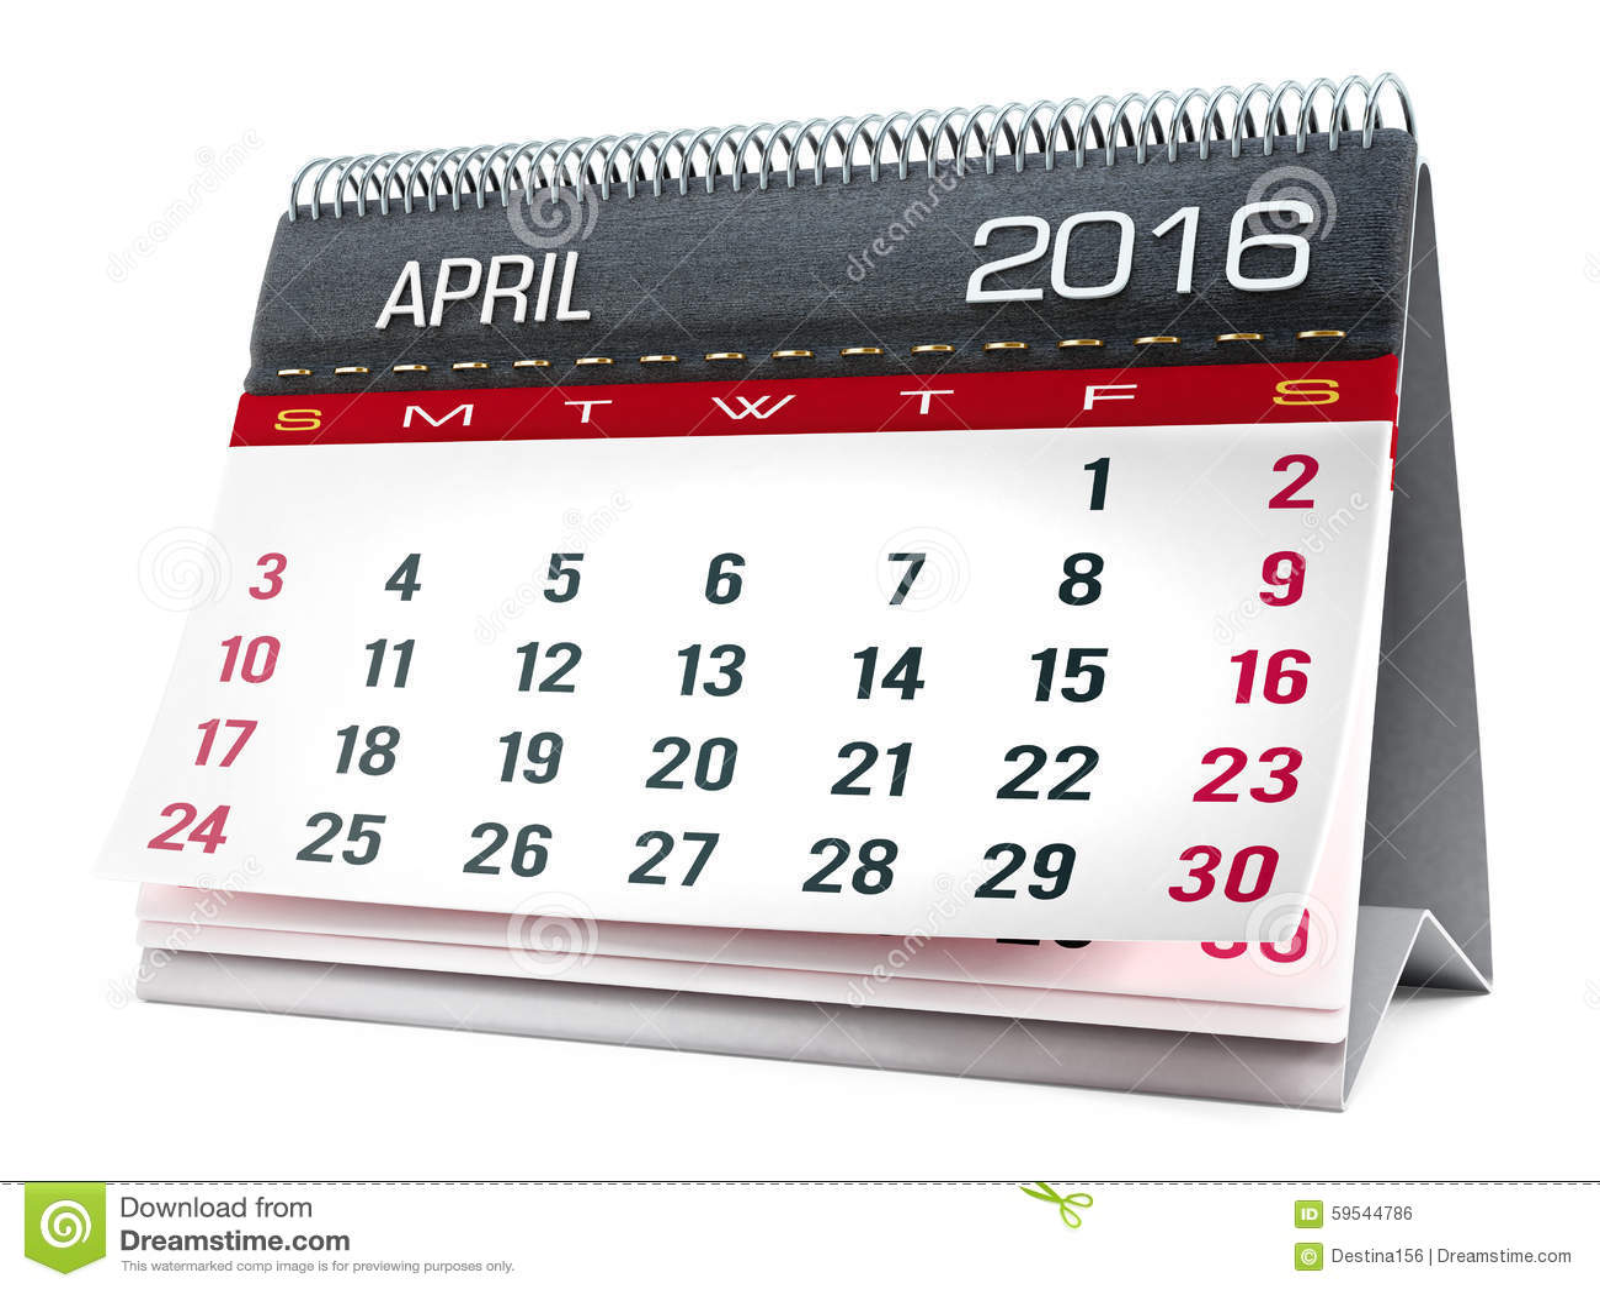 Desktop Calendar April 2016 april 2016 desktop calendar stock illustration - image: 59544786